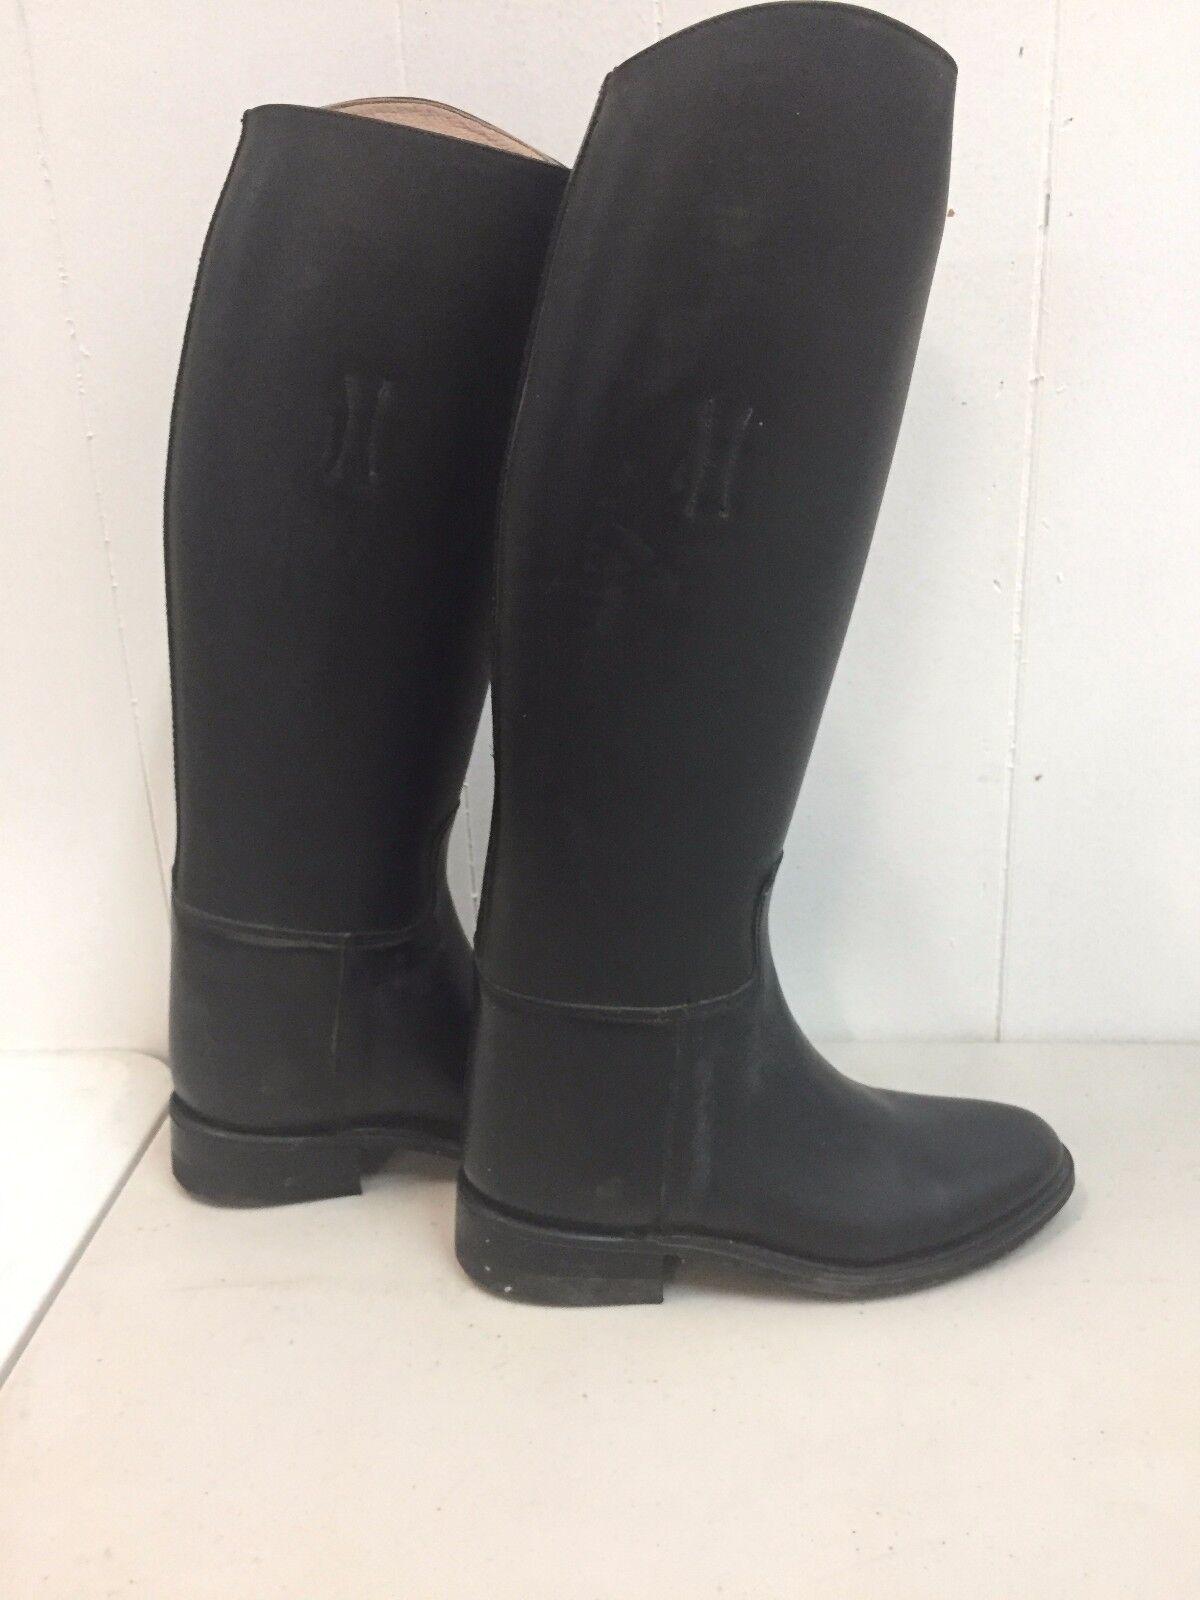 Effingham Bond bottes 10 Taille 3 en cuir Riding Equestrian bottes